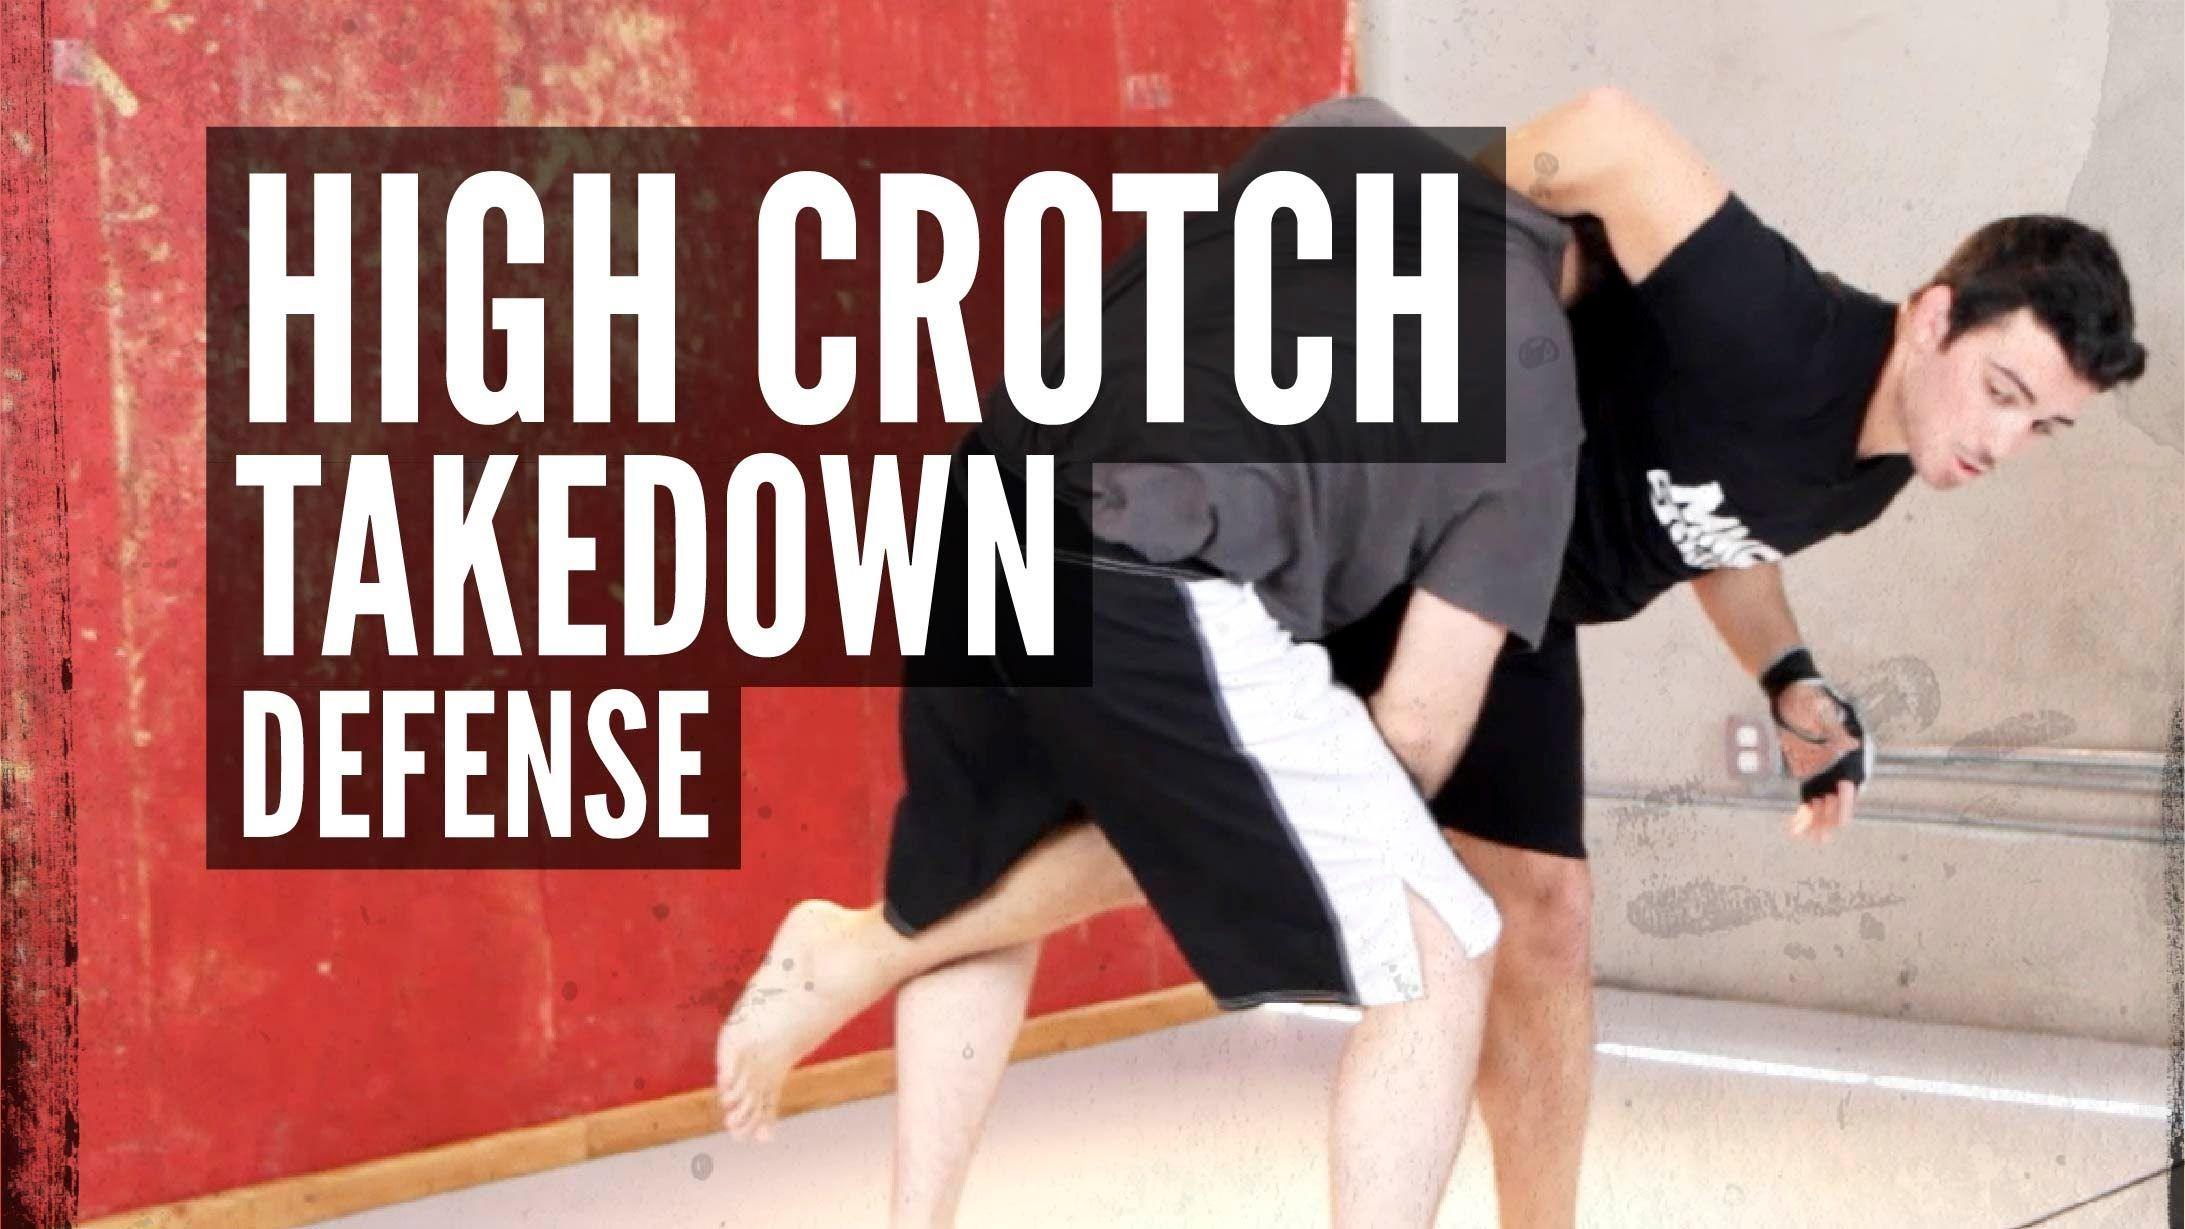 Defending The High Crotch Takedown Martial Arts Martial Martial Artist